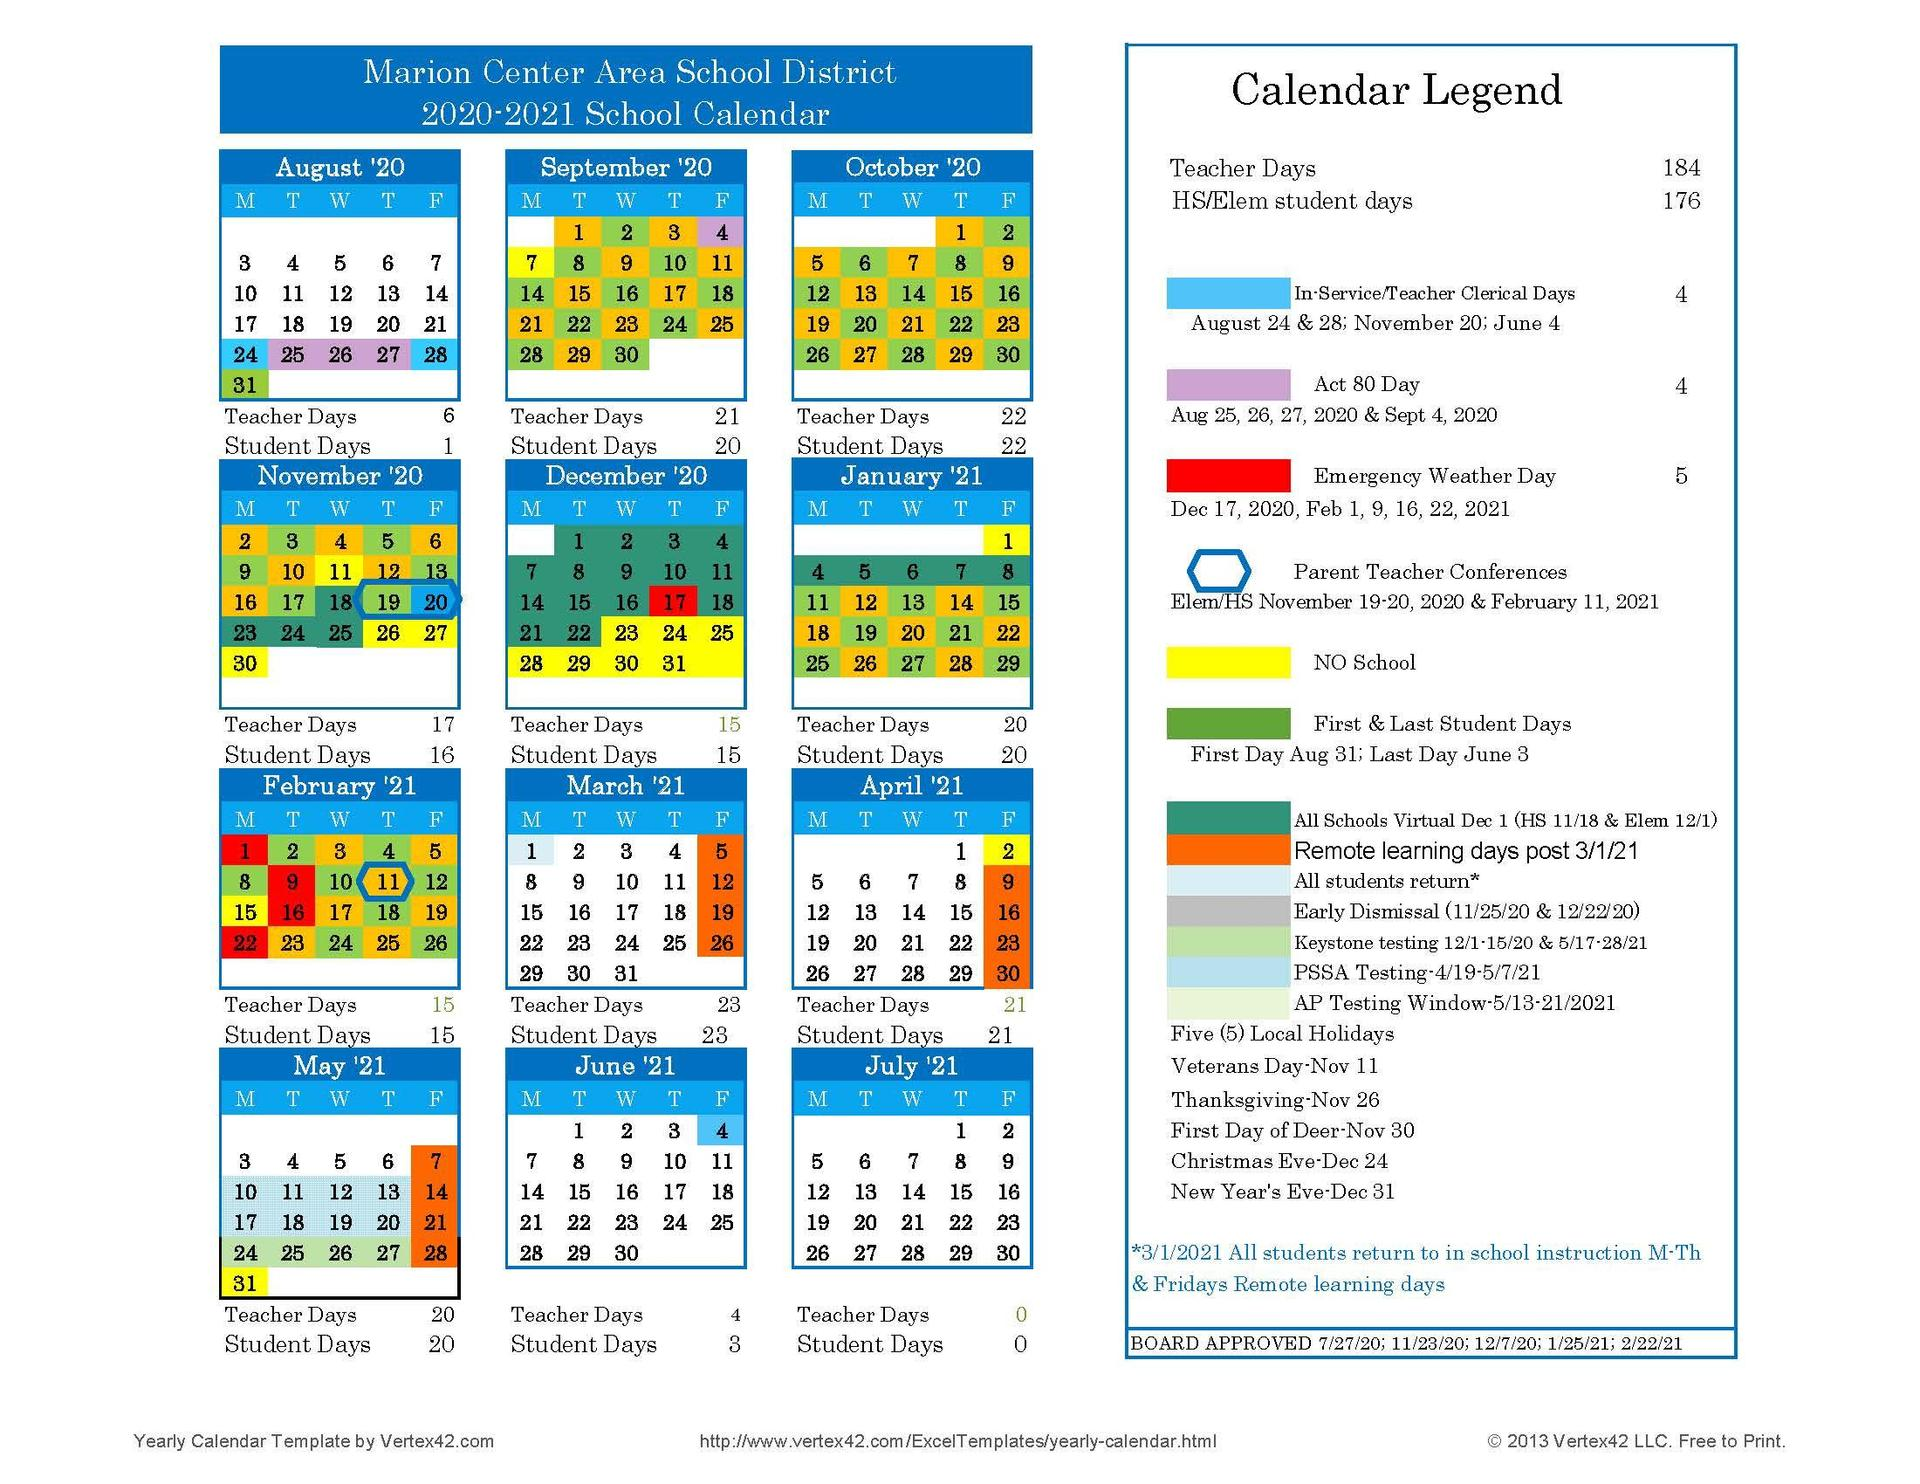 20-21 Revised School Calendar